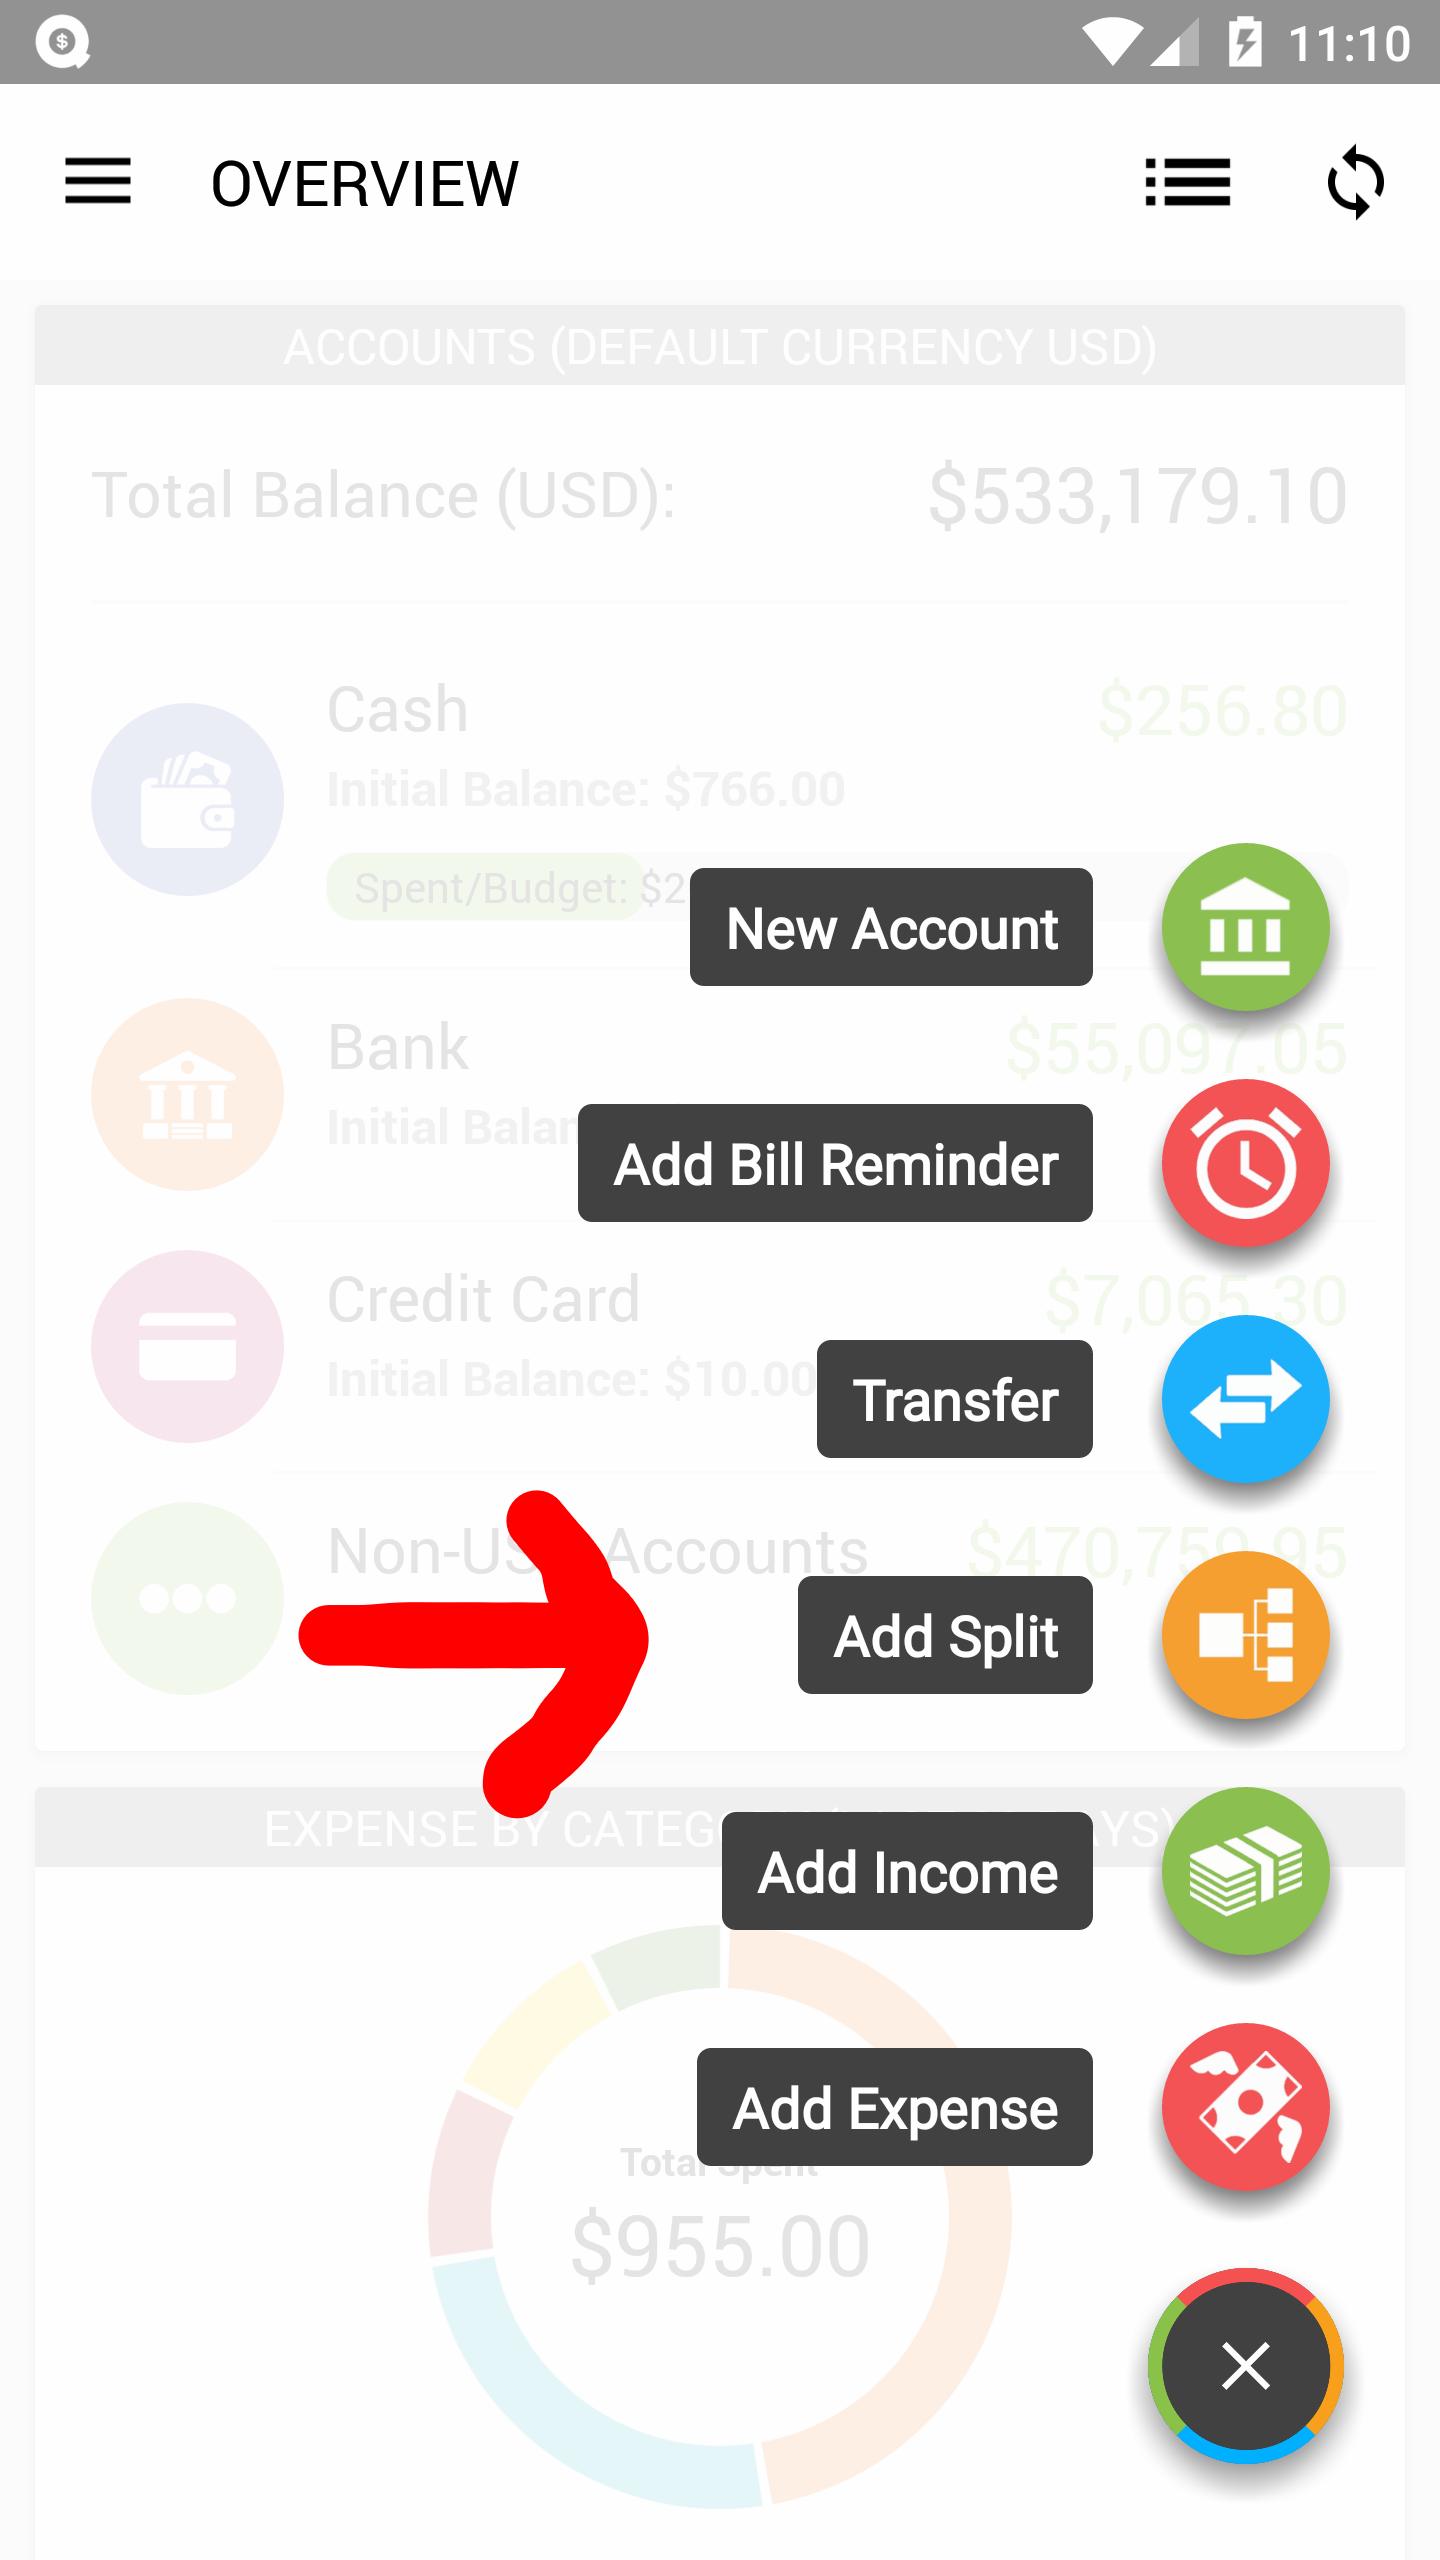 Add a Split Transaction